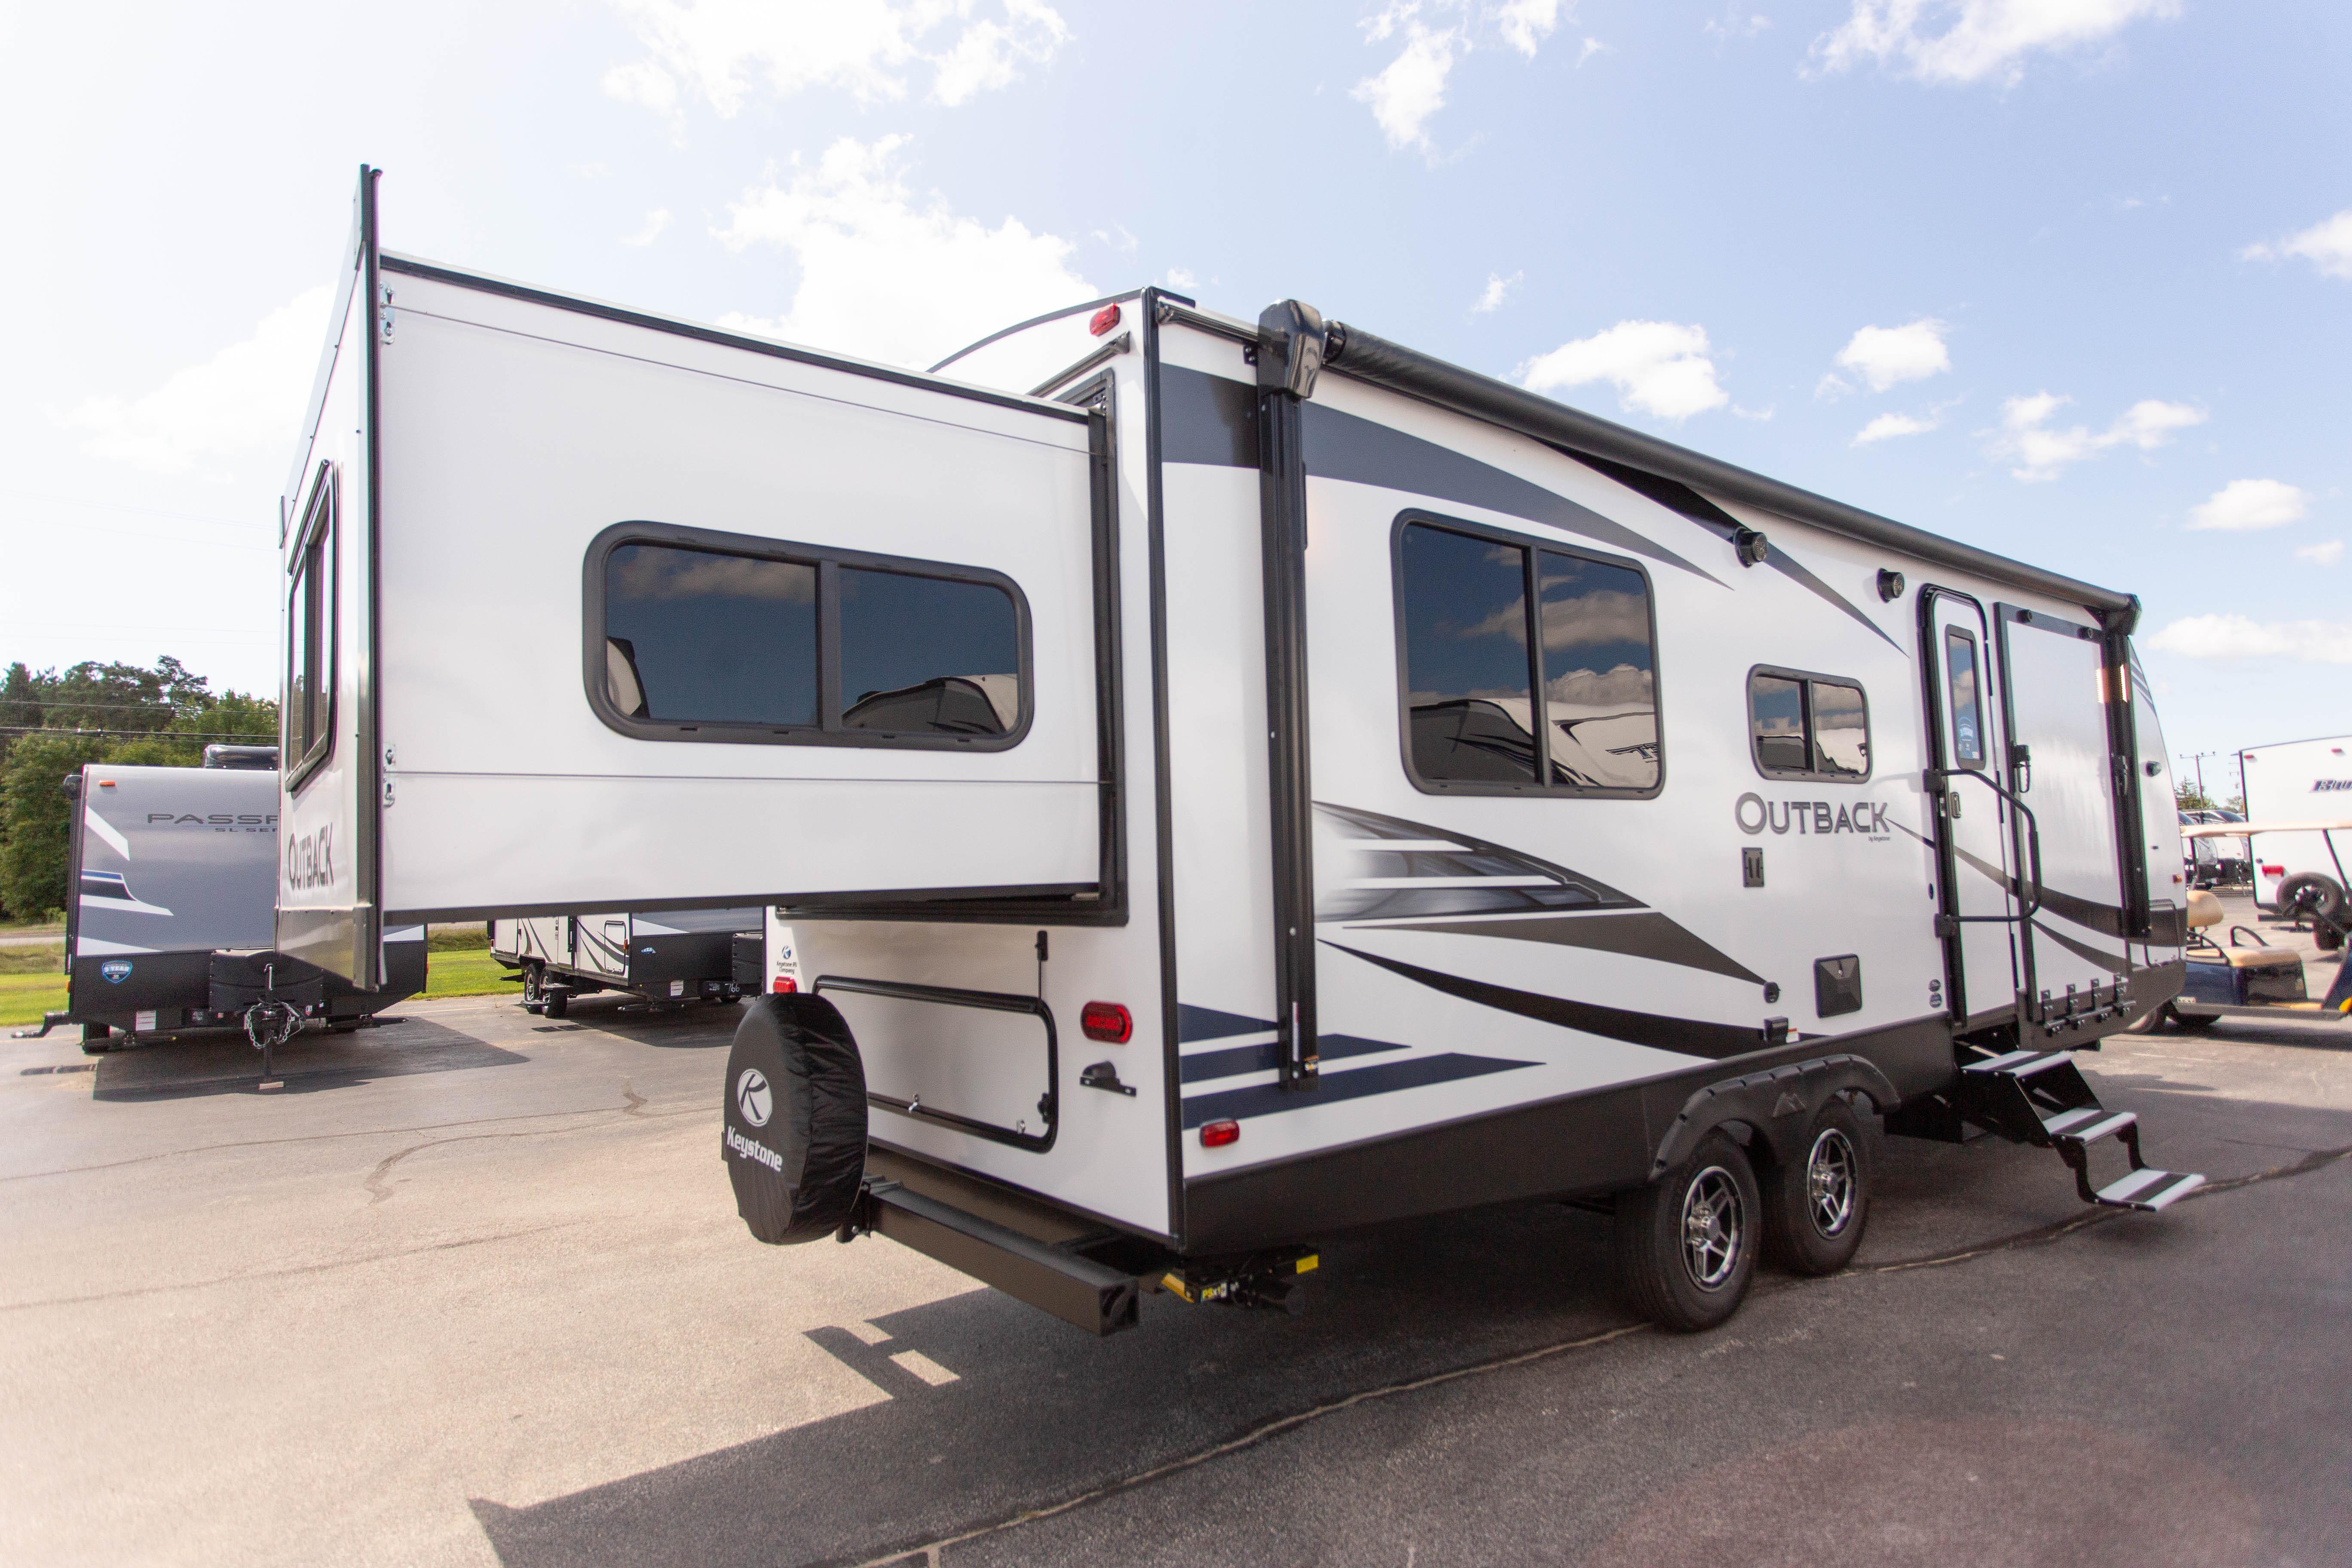 2020 Keystone Outback Ultra Lite 240URS Camper   eBay